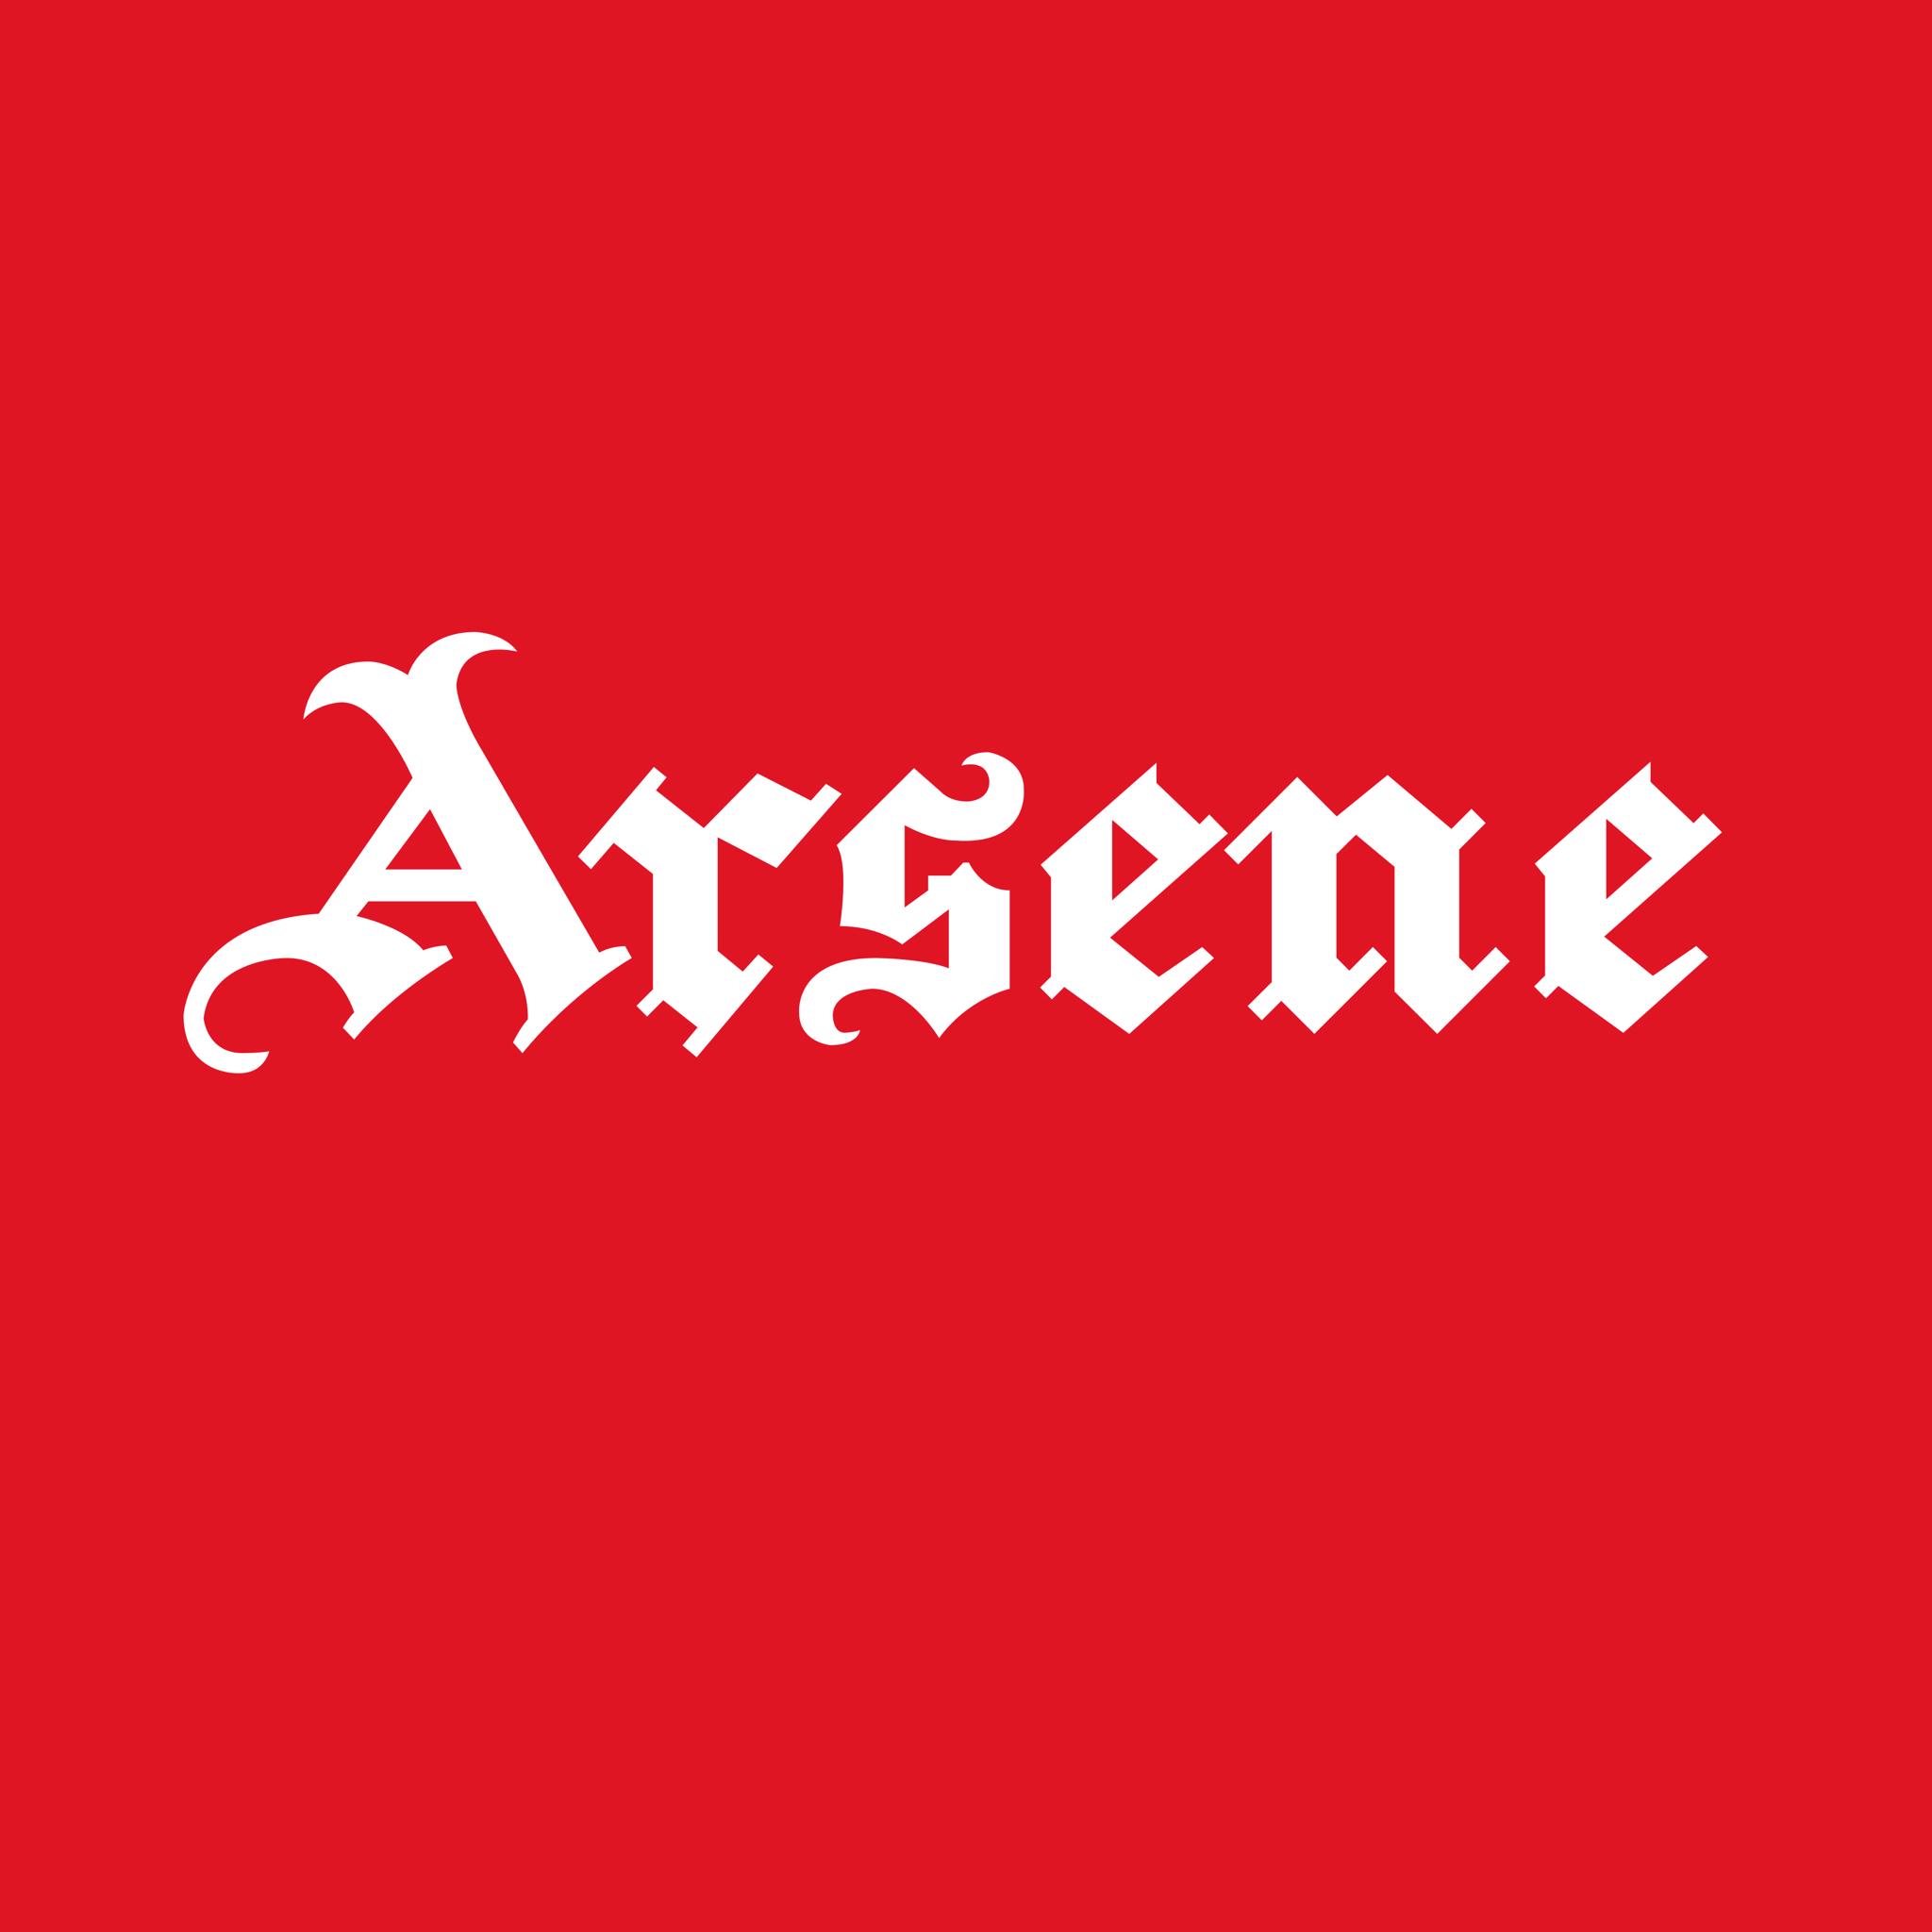 Arsene Wenger - Arsenal - 20 Years - Benjamin Zierock - Illustration - Medien und Kommunikation